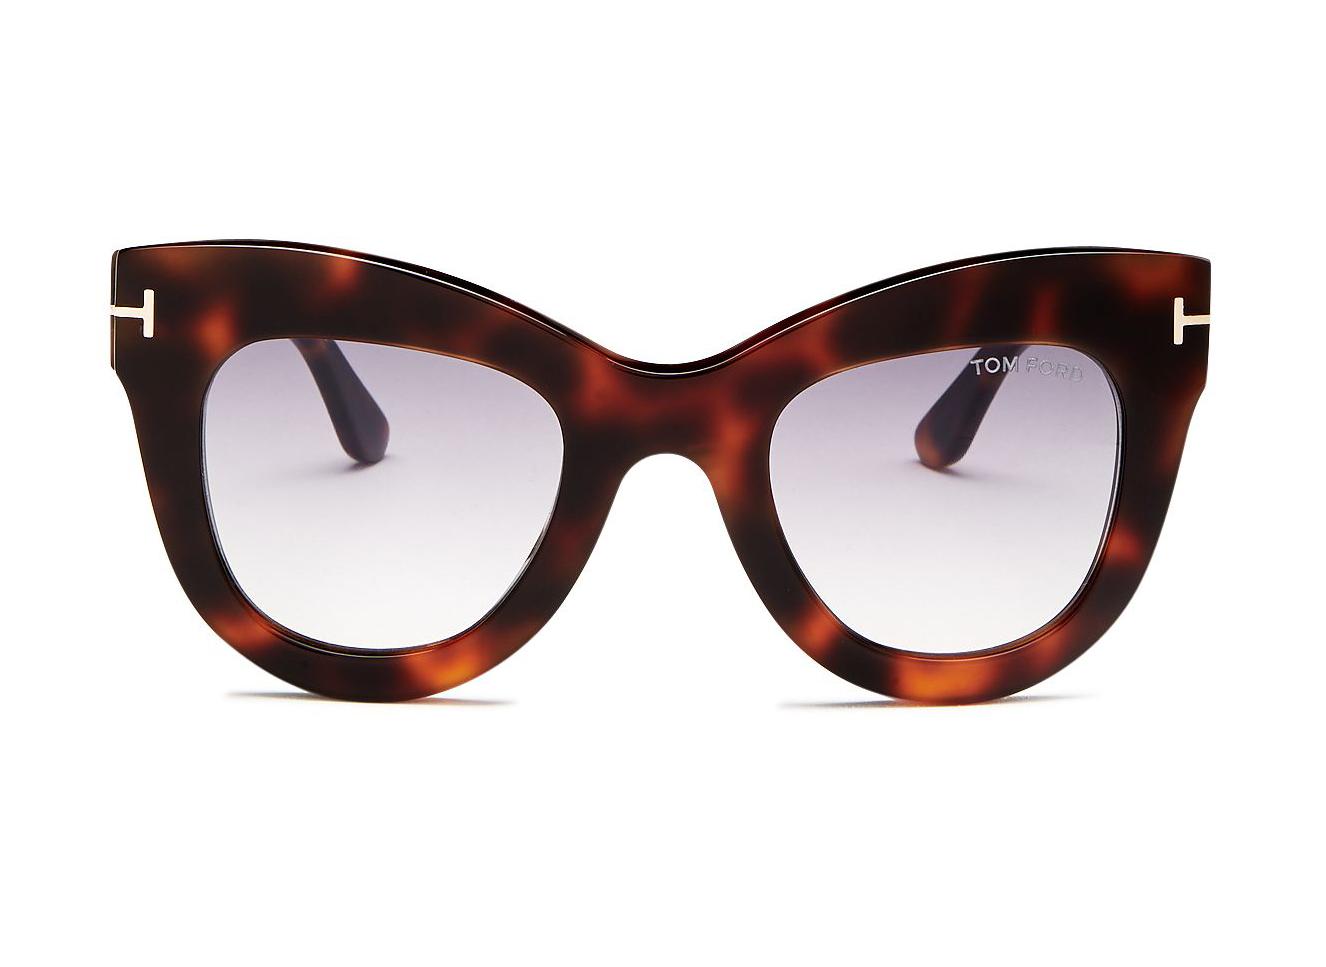 Tom Ford Women's Karina Cat Eye Sunglasses